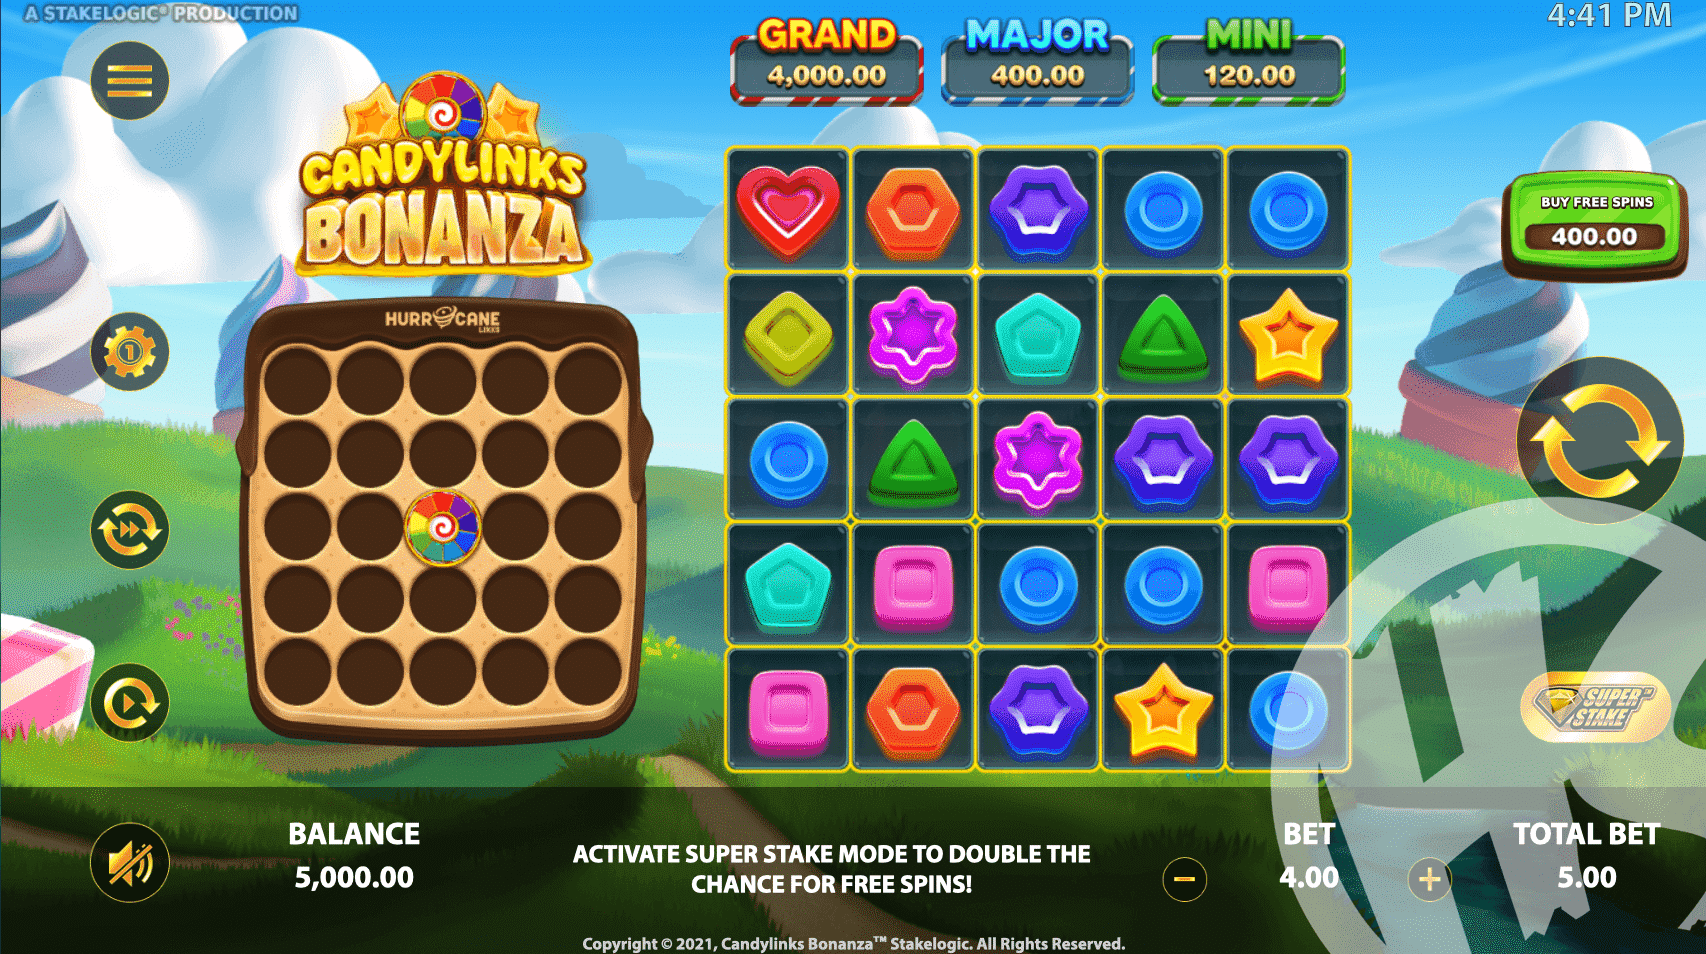 Candy Links Bonanza Base Game